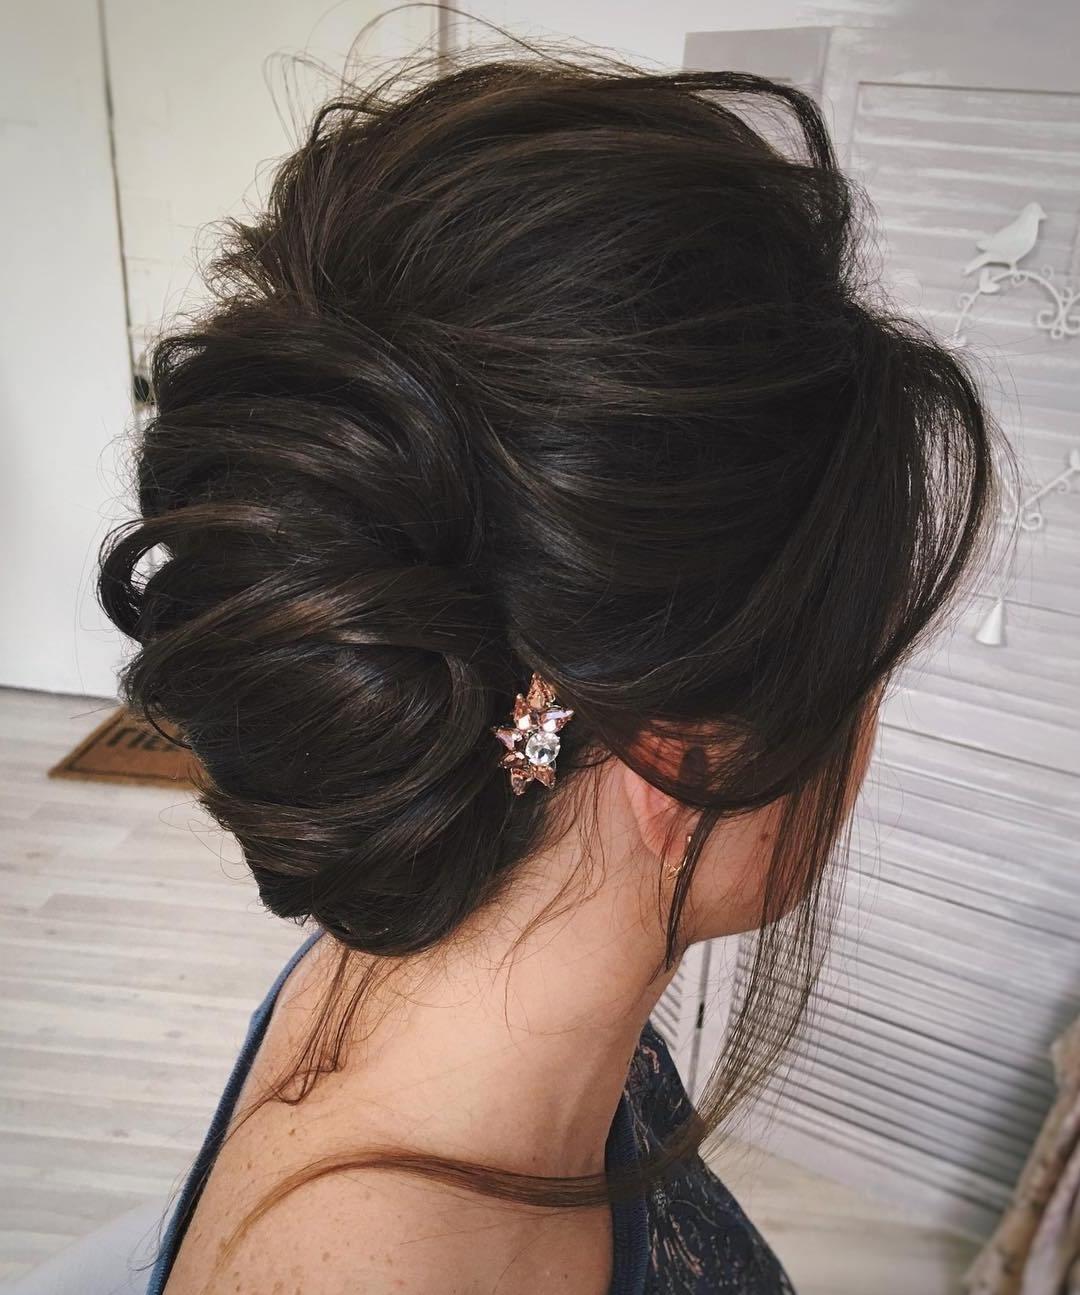 Long Hair Archives – Trubridal Wedding Blog Regarding Trendy Messy Wedding Hairstyles For Long Hair (View 4 of 15)